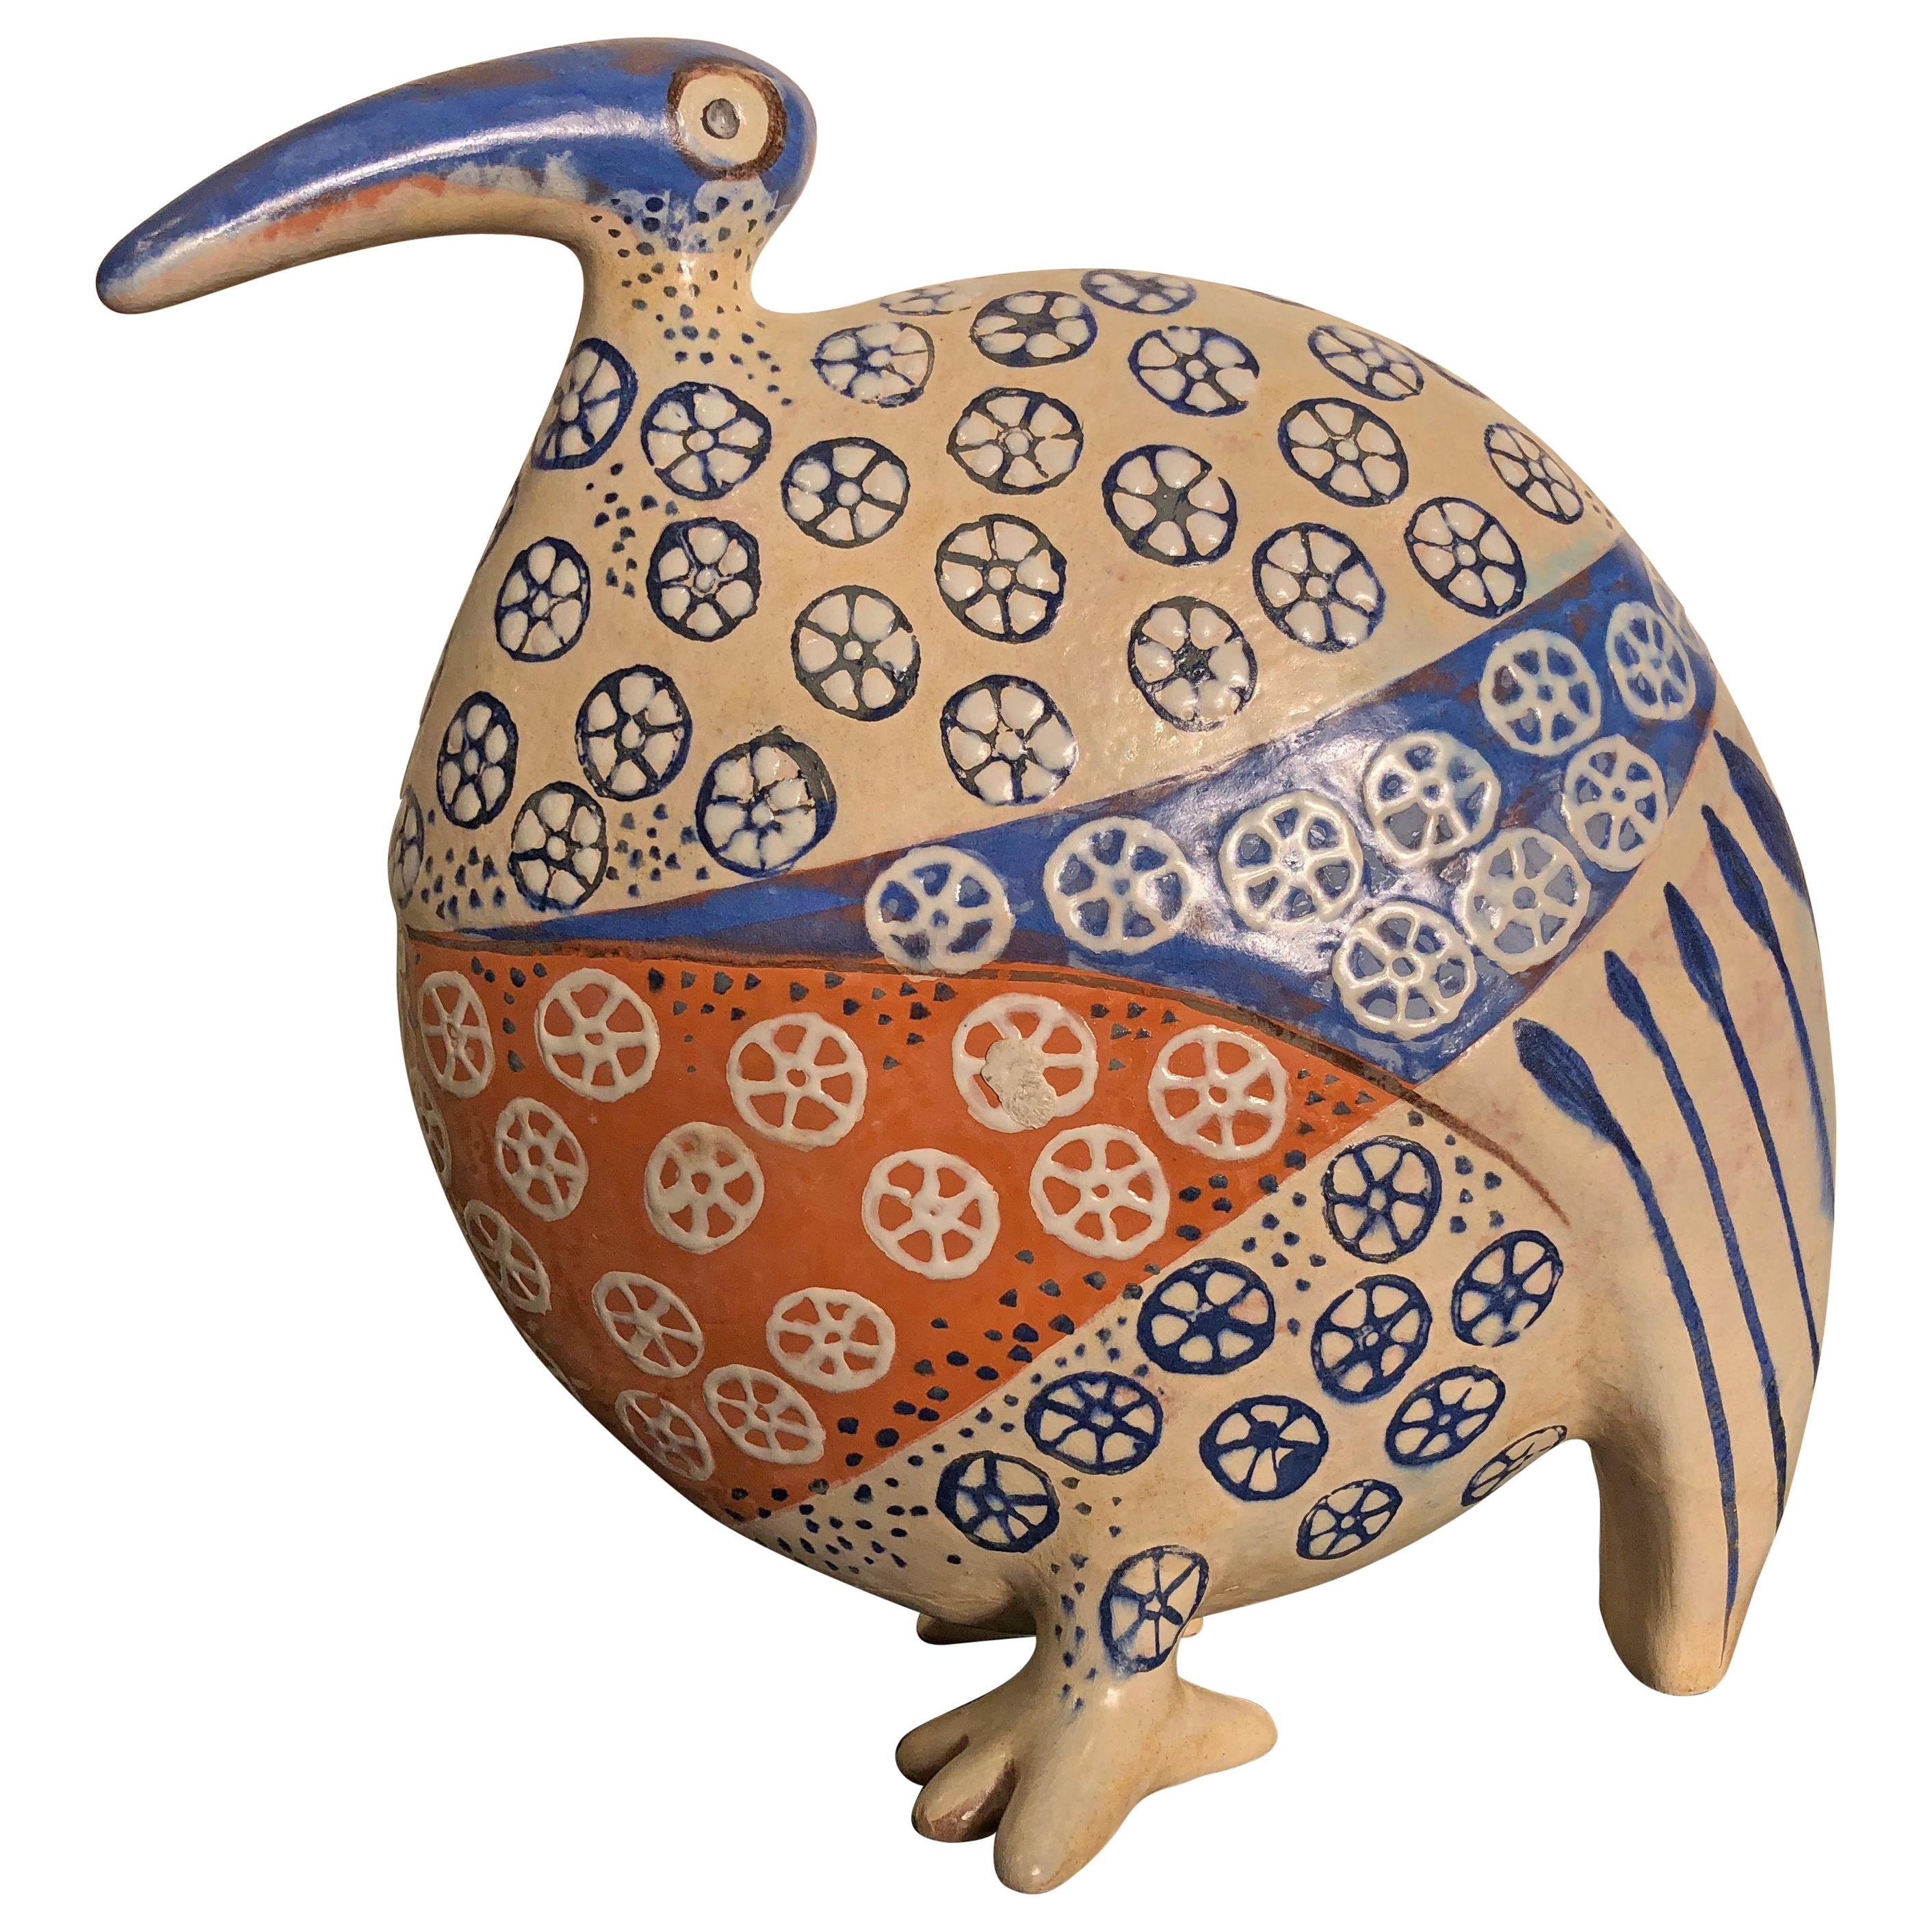 Big Beautiful Blue Bird Handmade Hand Painted Master Artisan Eva Fritz-Lindner